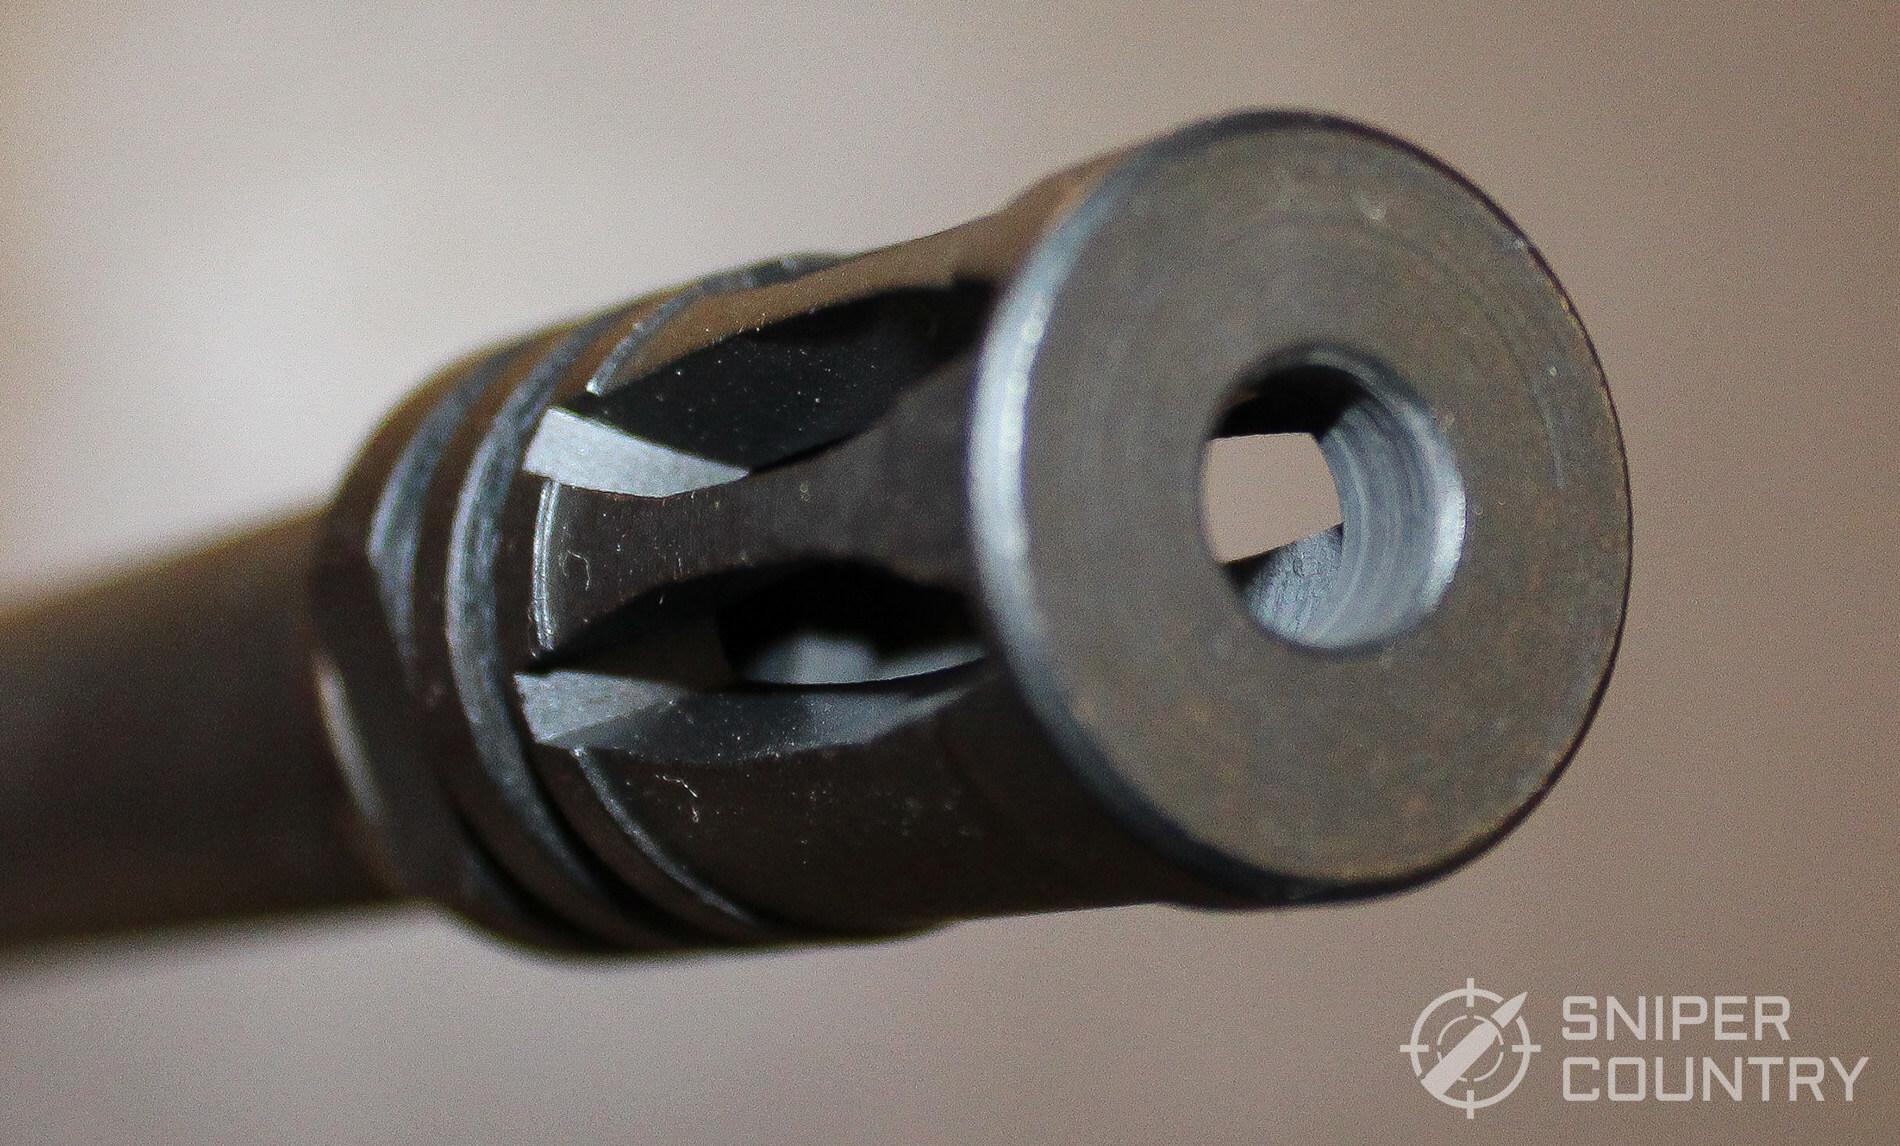 Mossberg 715T muzzle close-up